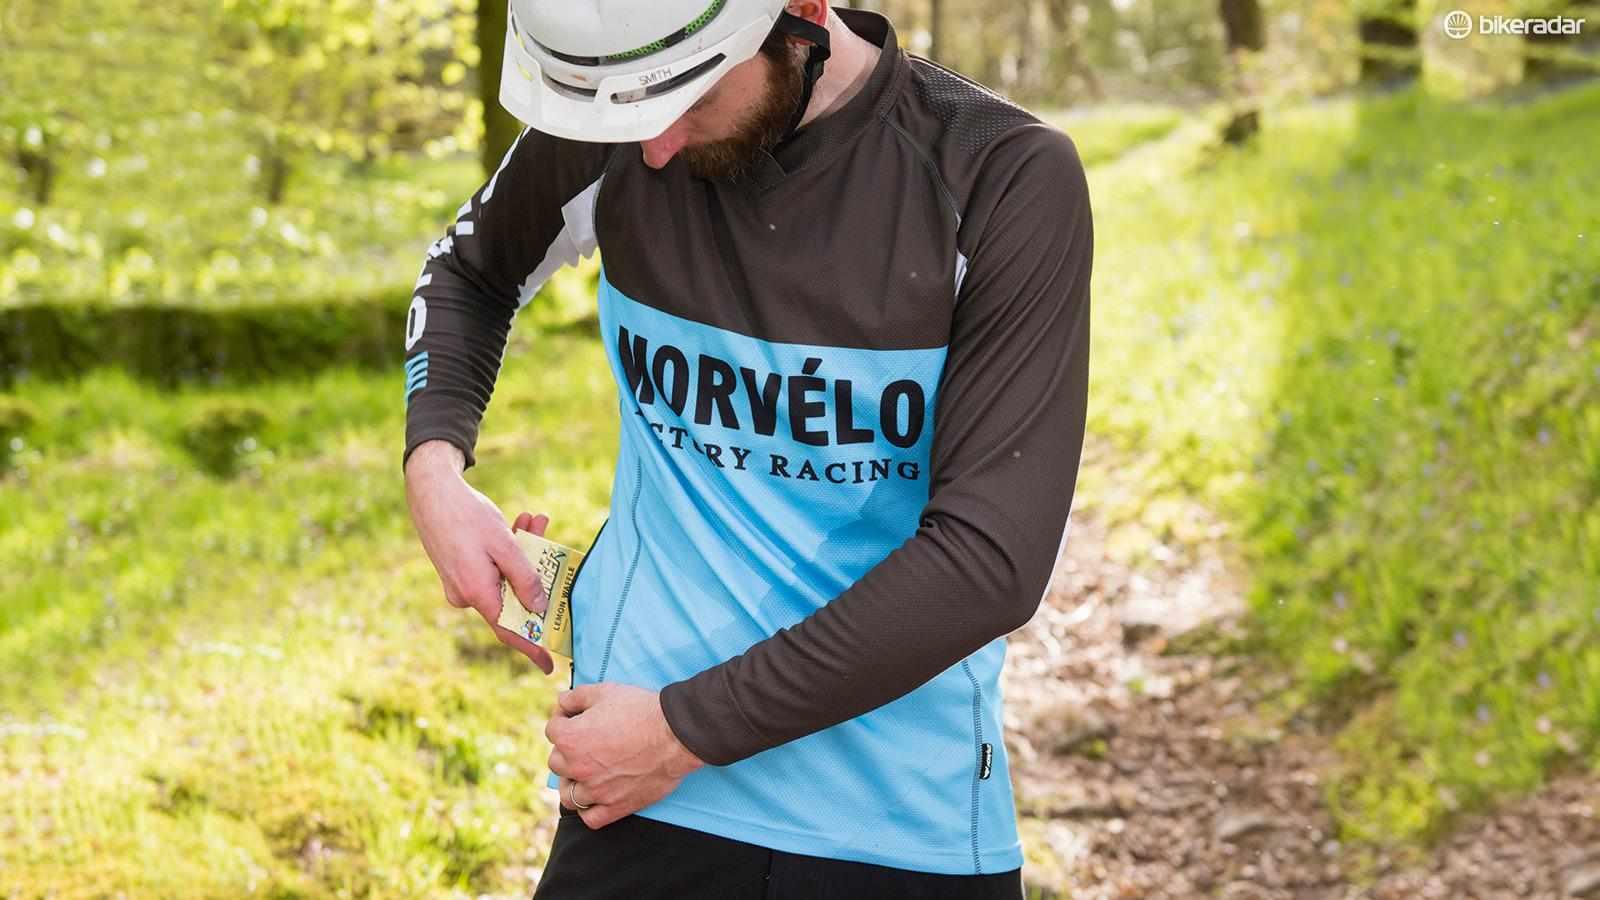 Morvélo's Factory jersey is a seriously impressive garment